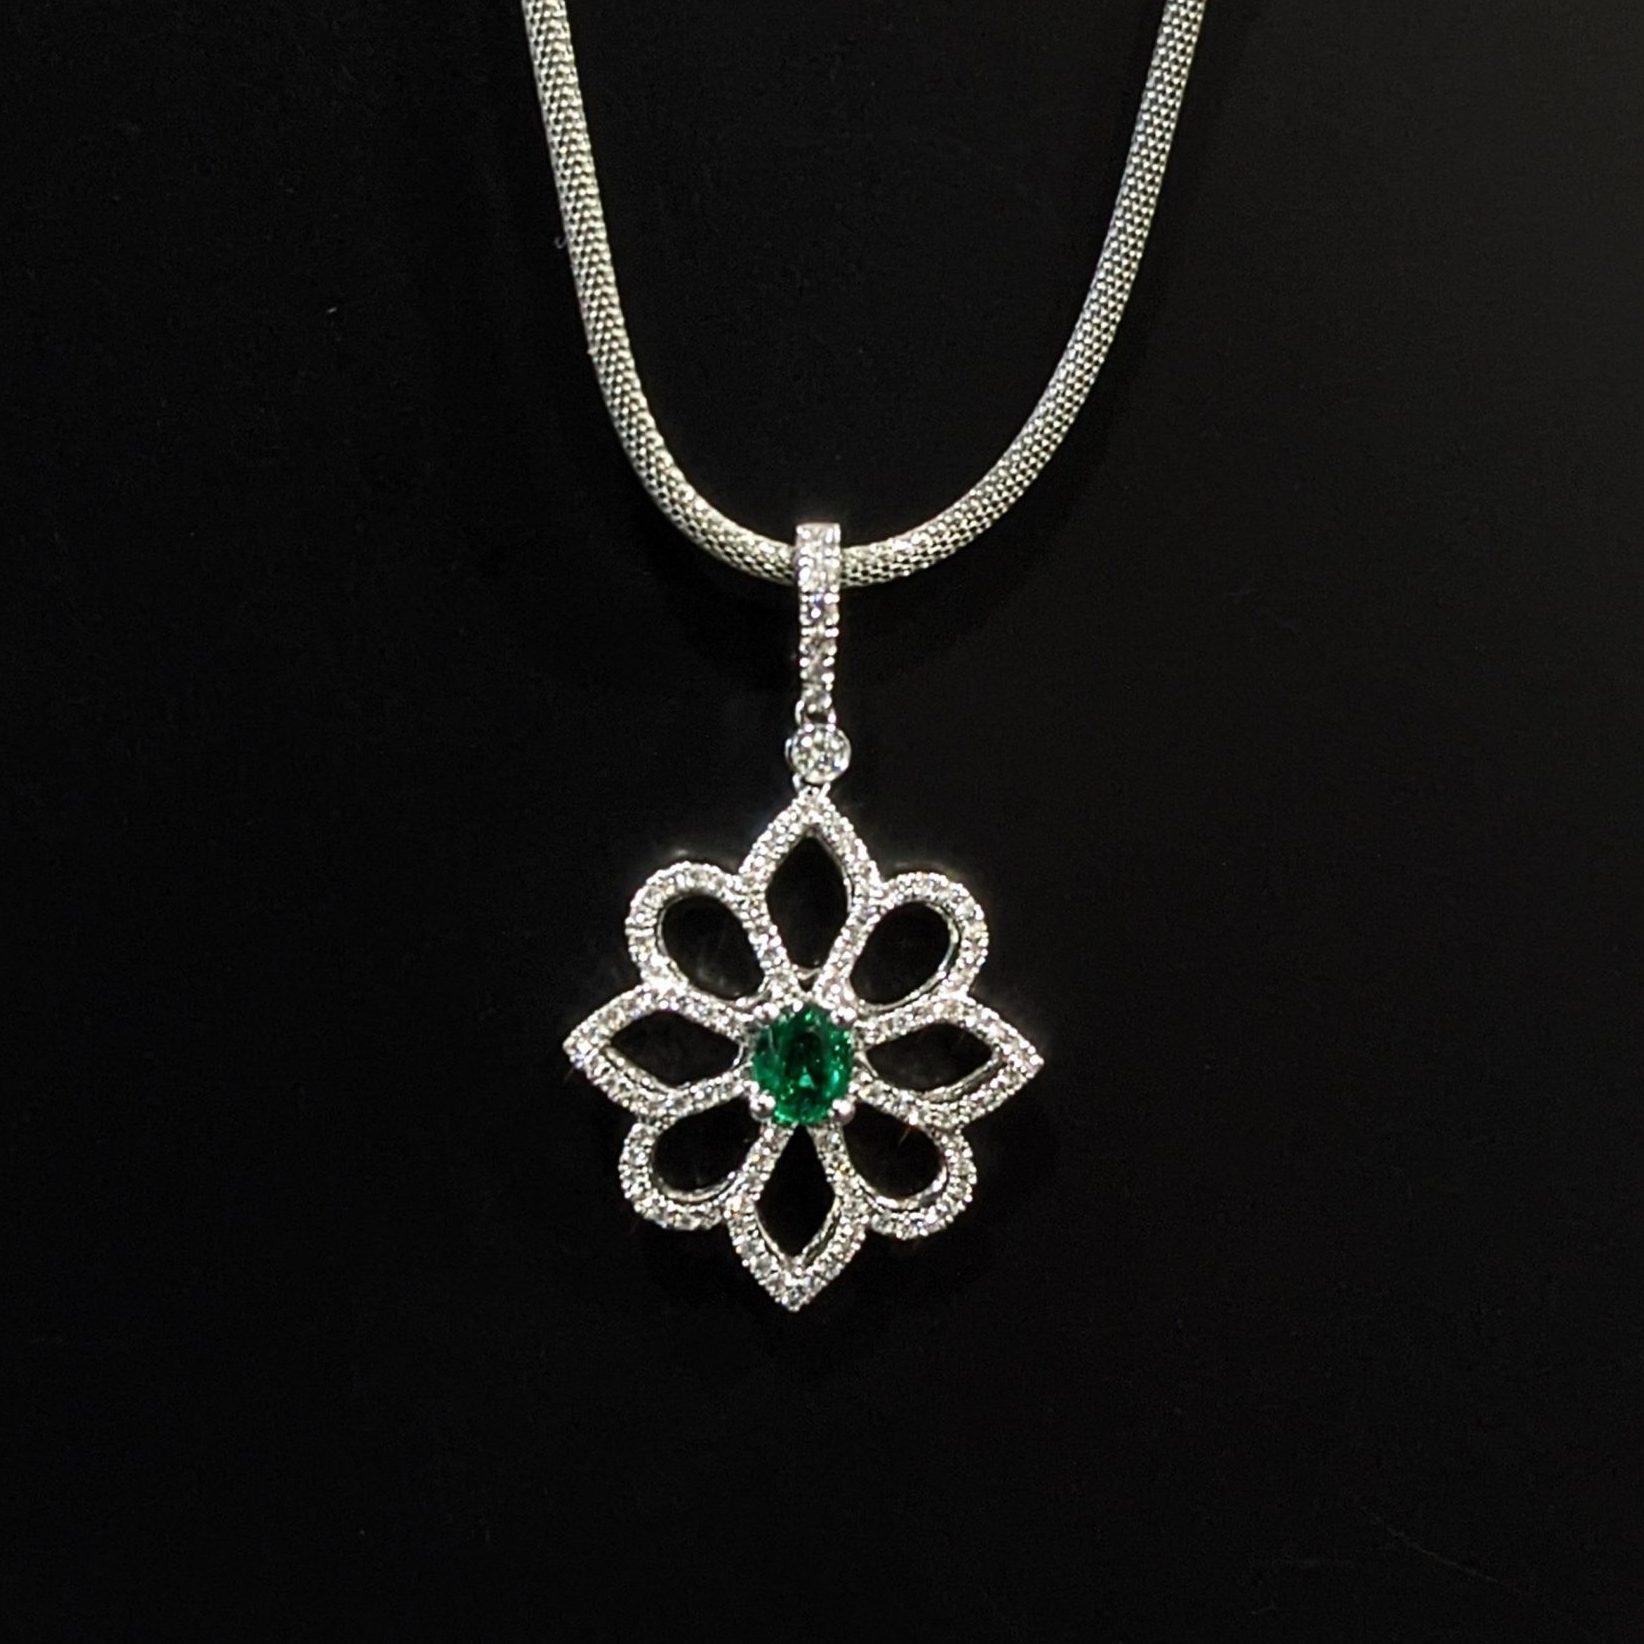 emerald and diamond ladies pendant